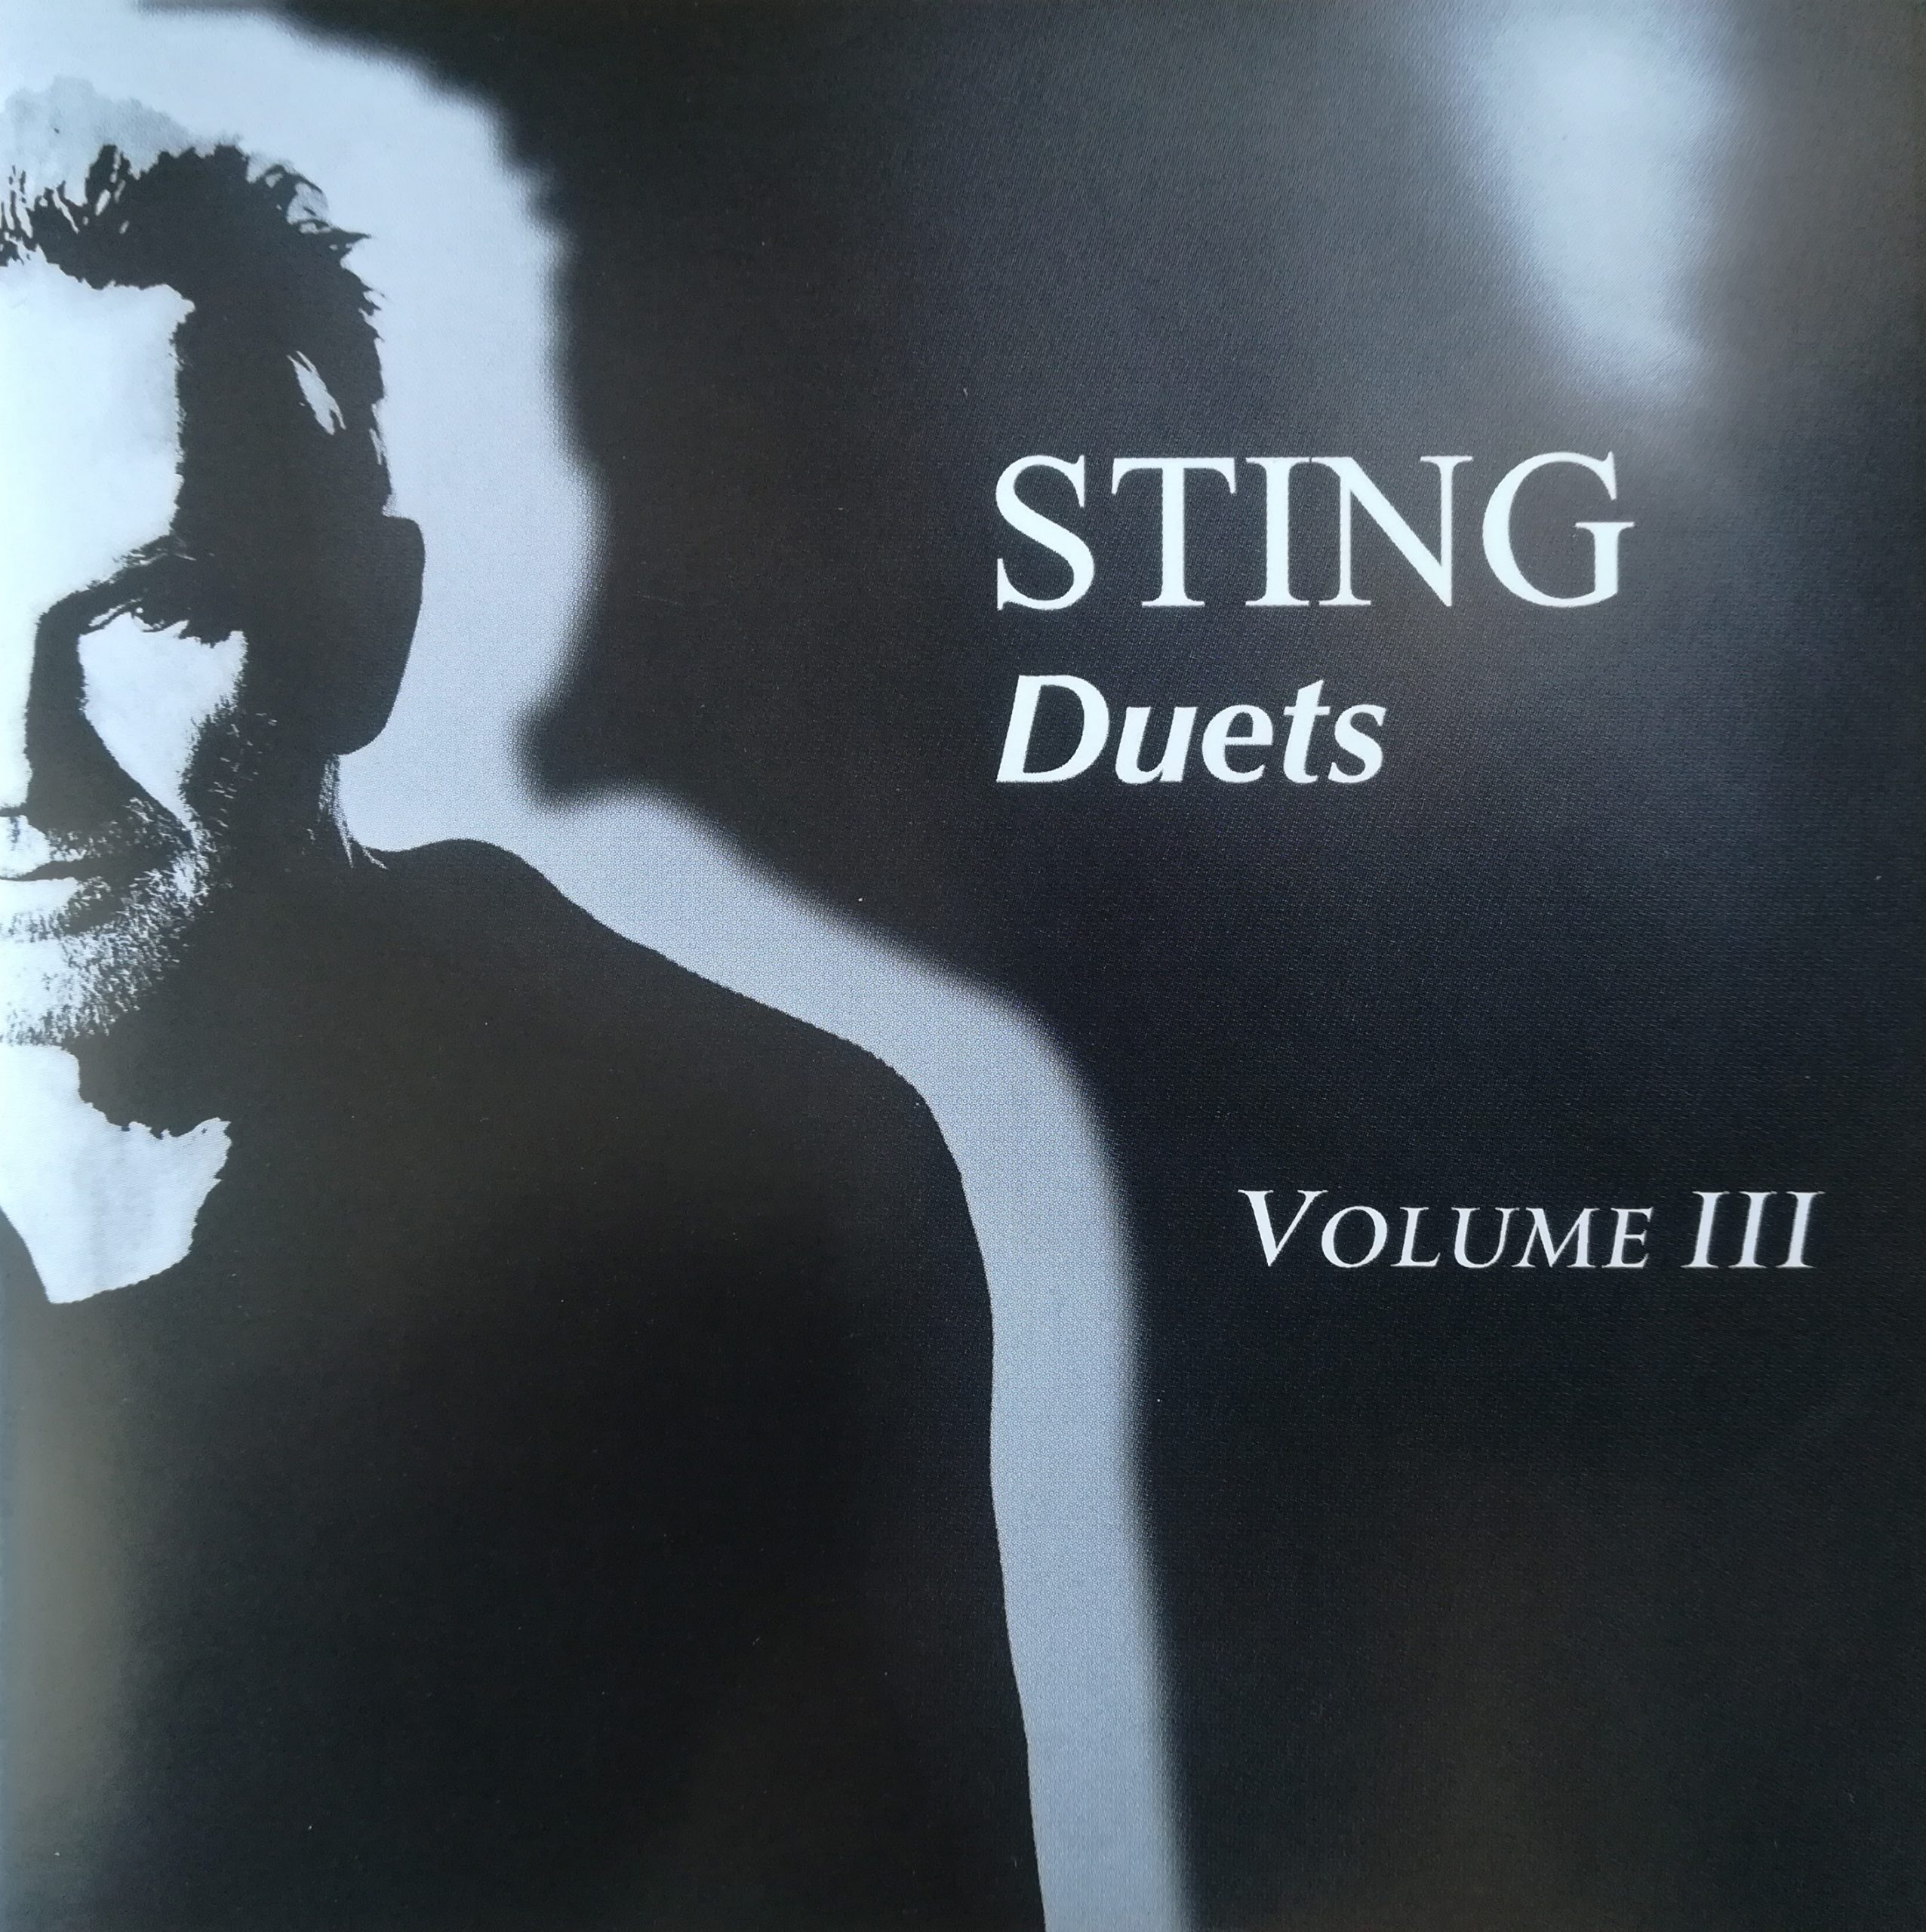 Sting - Duets. Volume III (2021)